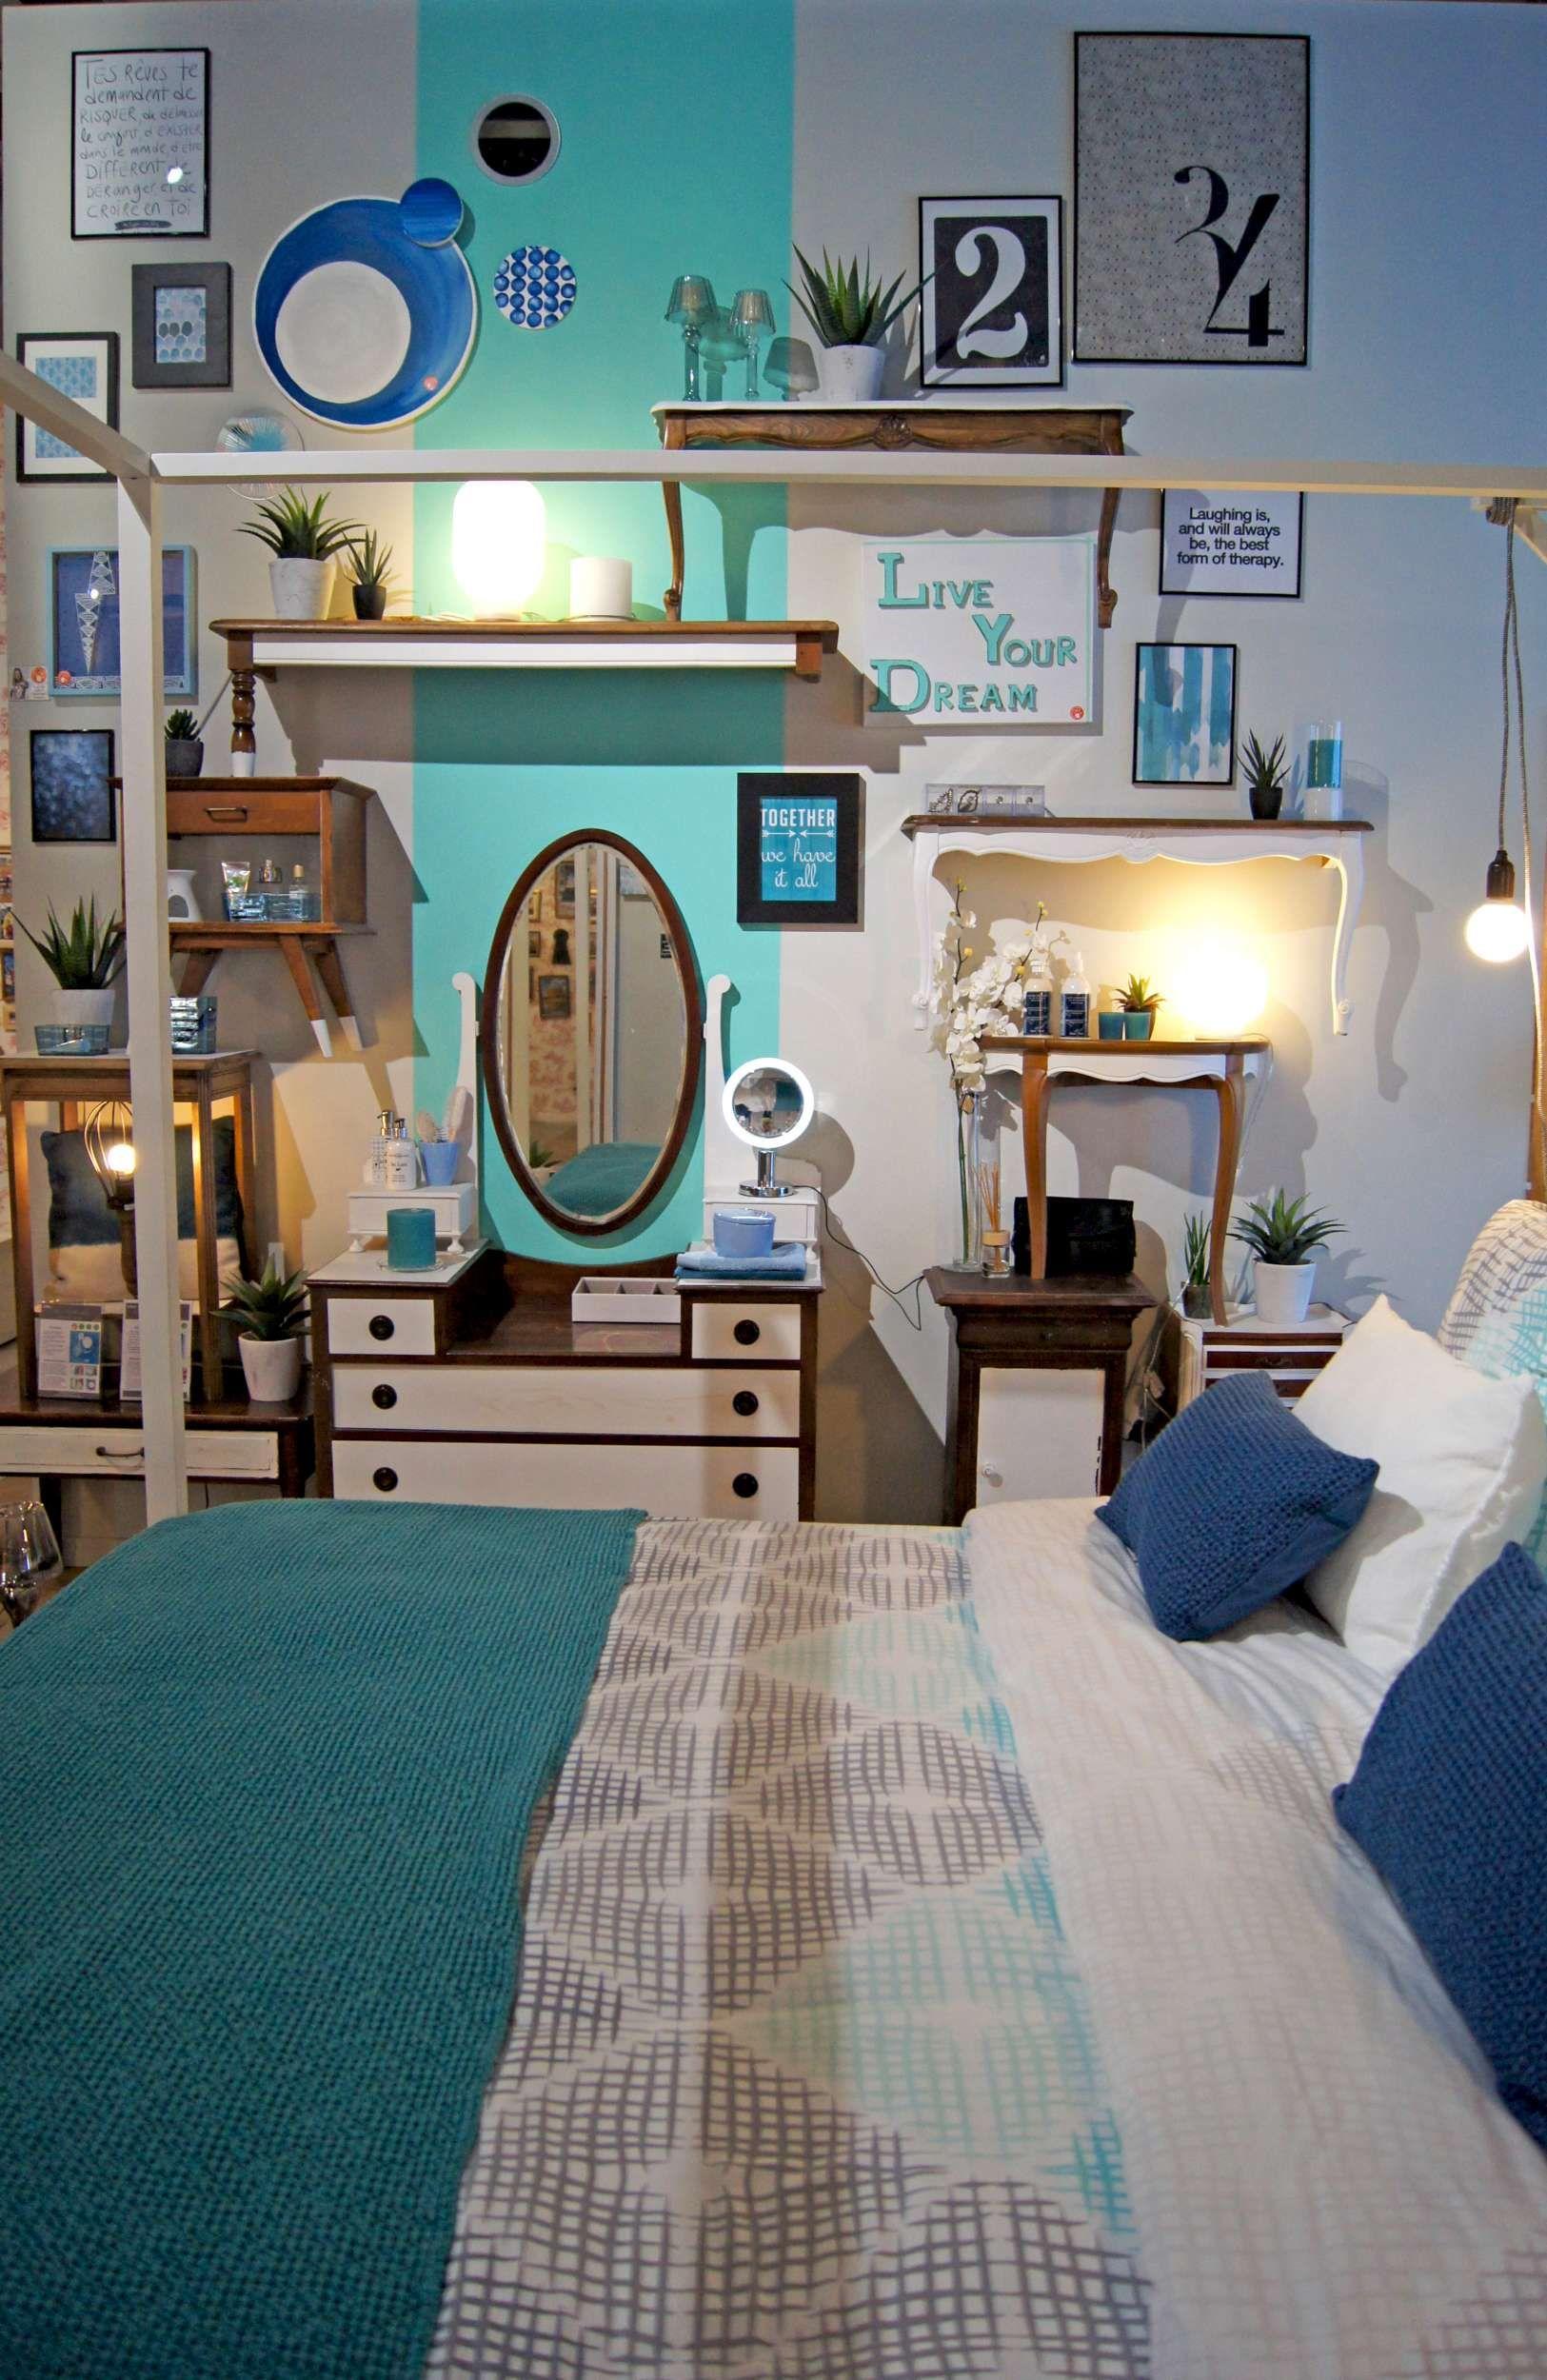 Tendance chambre coucher zodio chambre - Tendance chambre a coucher ...